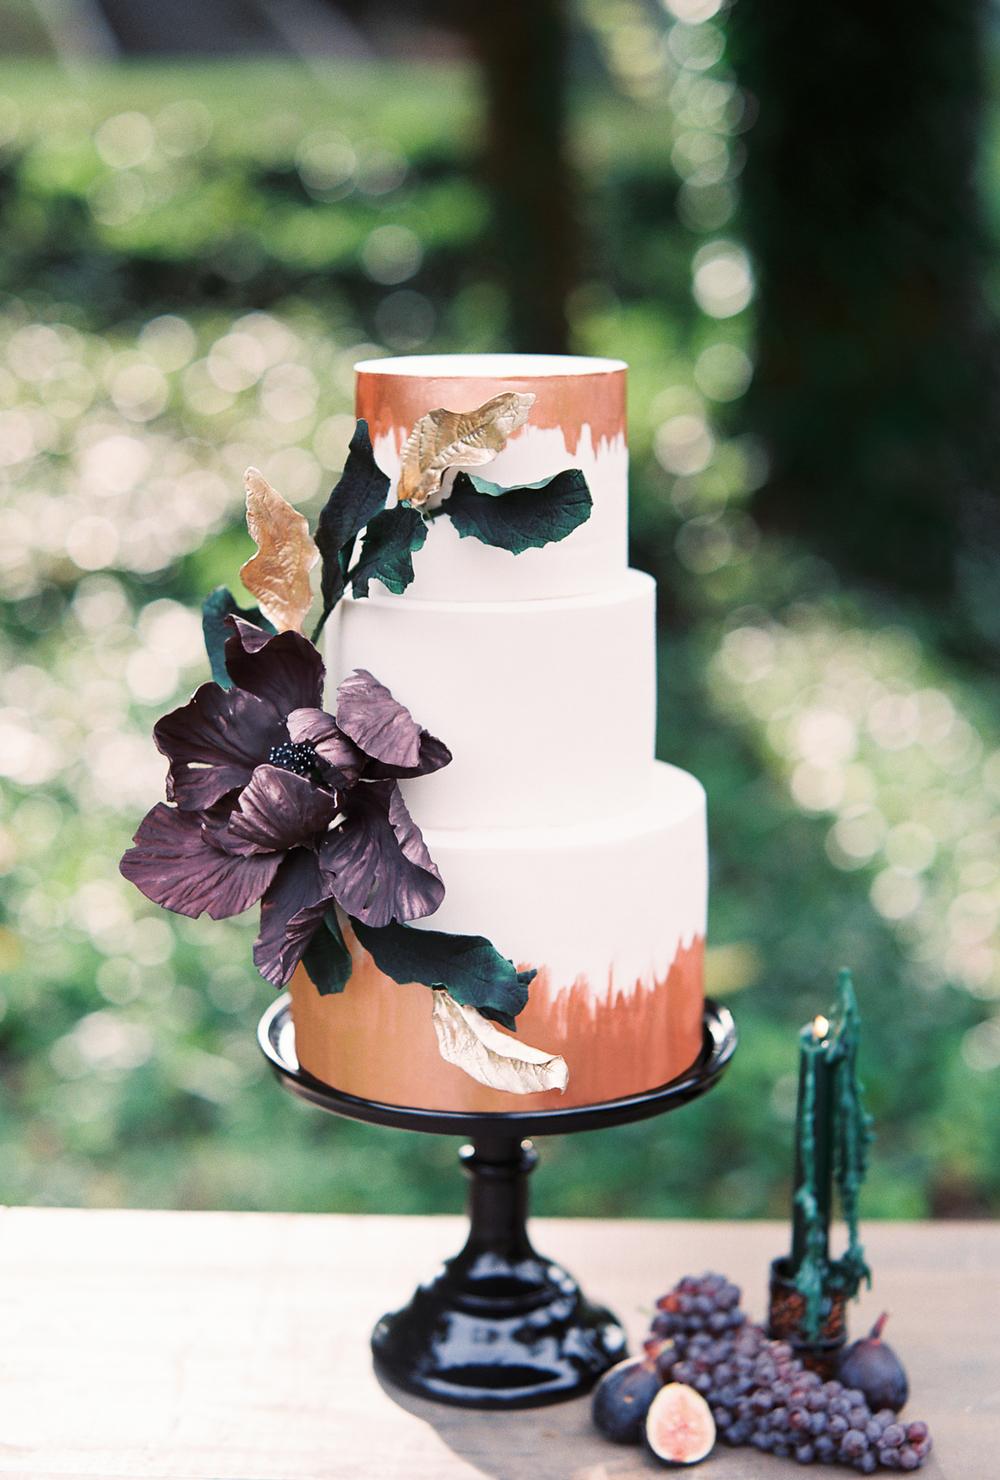 toccoa-falls-cake--1.jpg